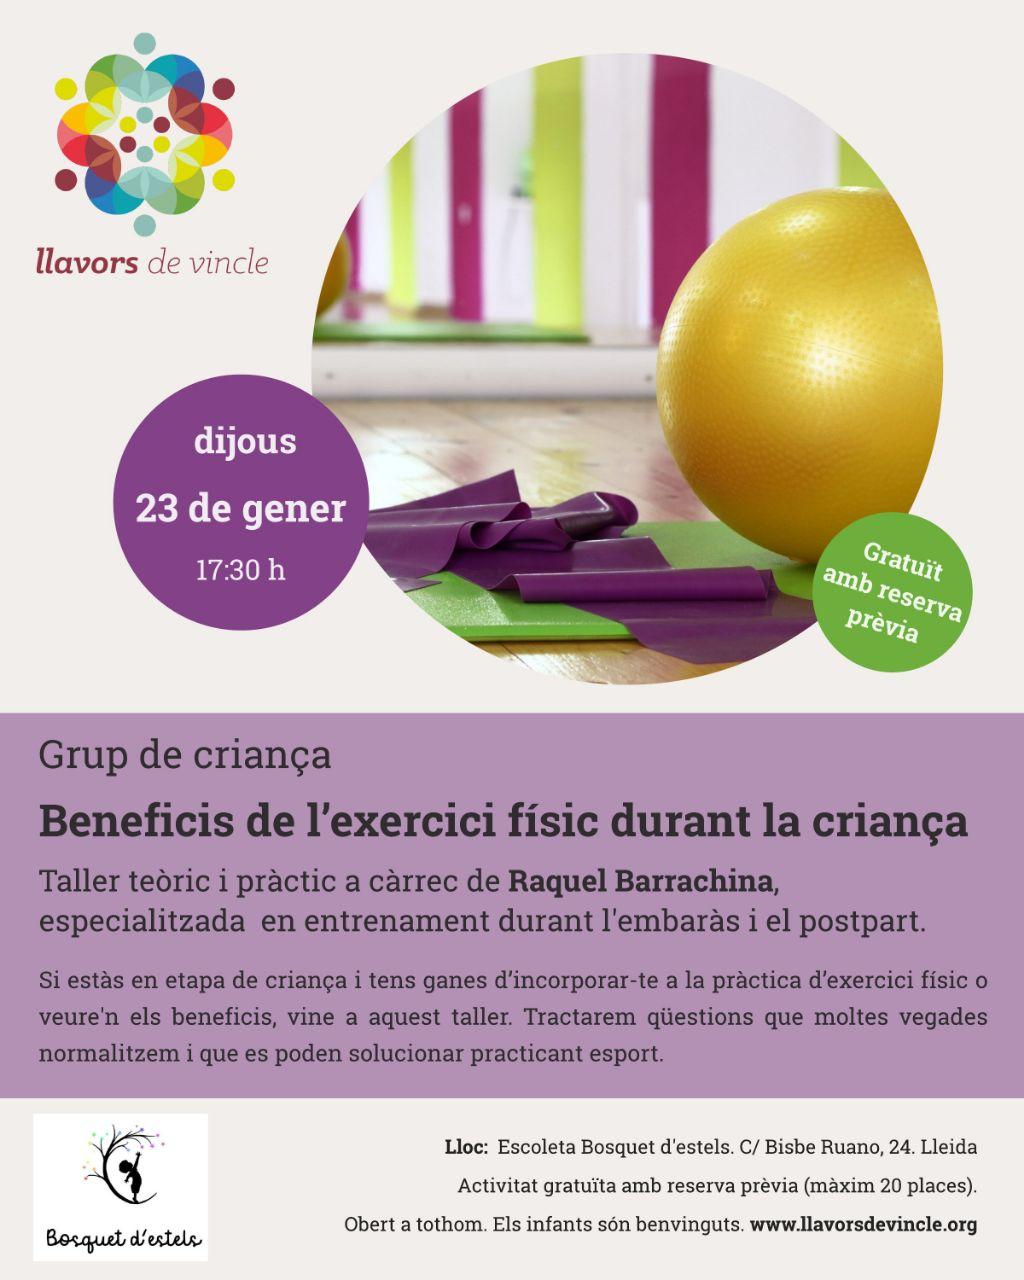 Beneficis de l'exercici físic durant la criança